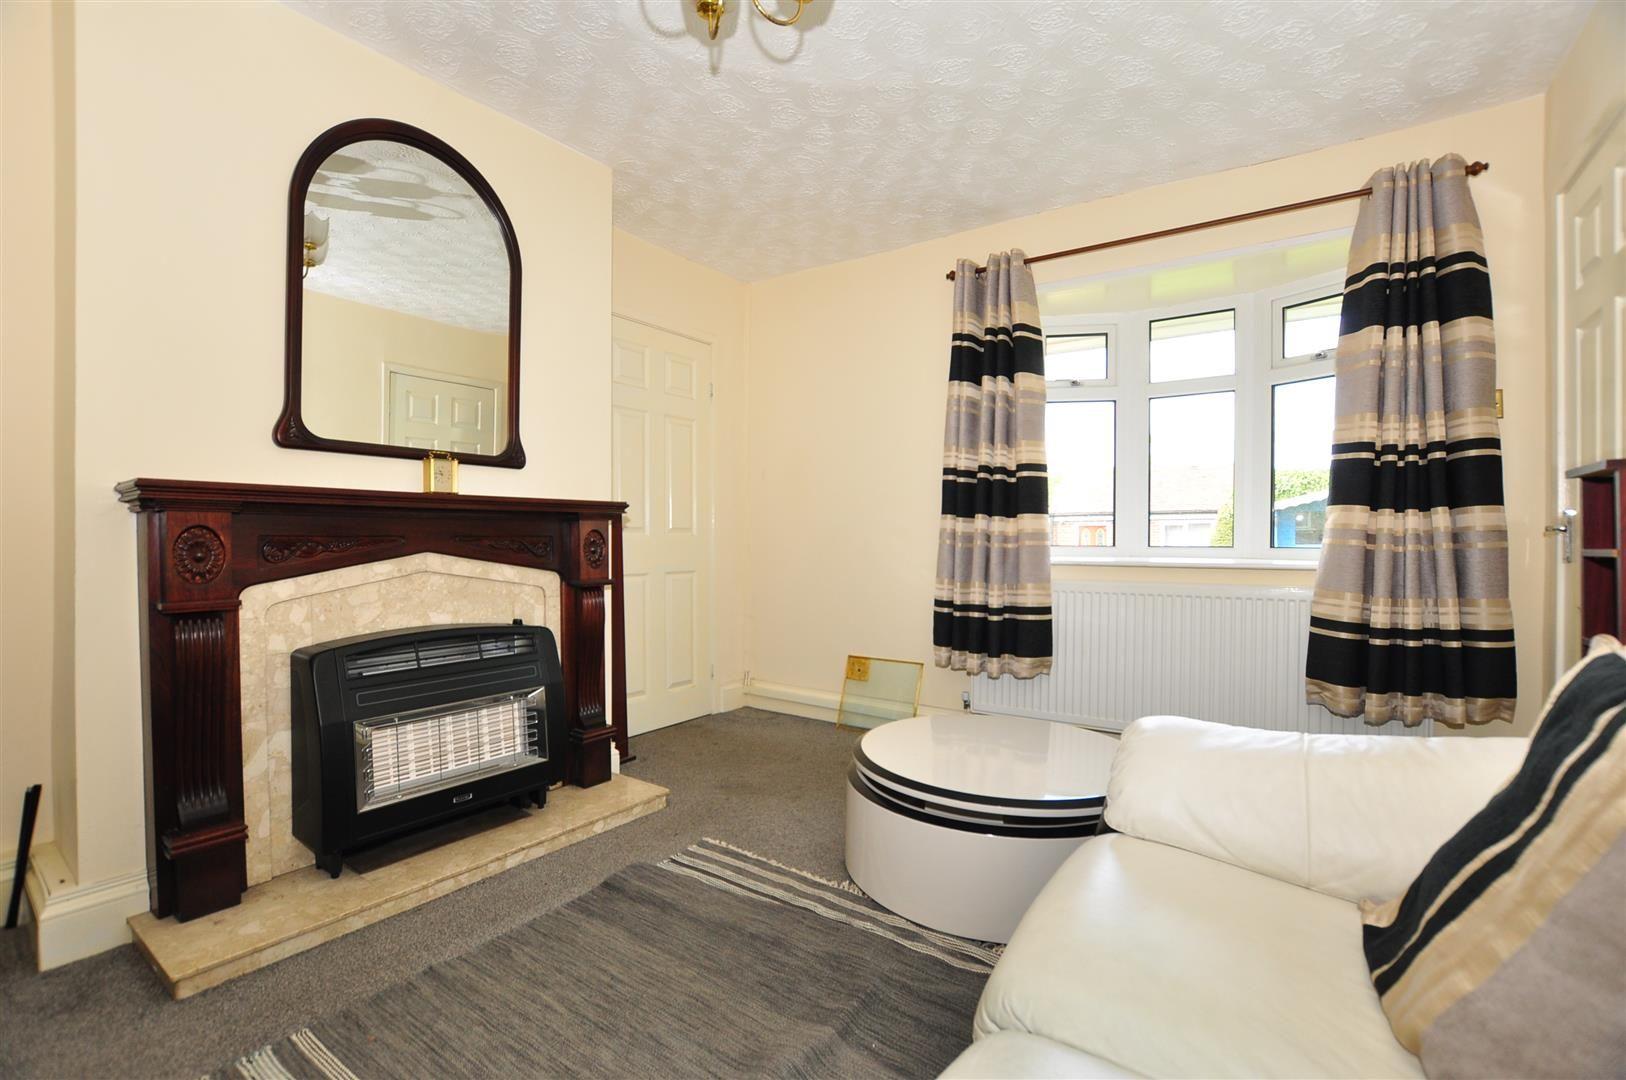 2 bed detached for sale  - Property Image 5